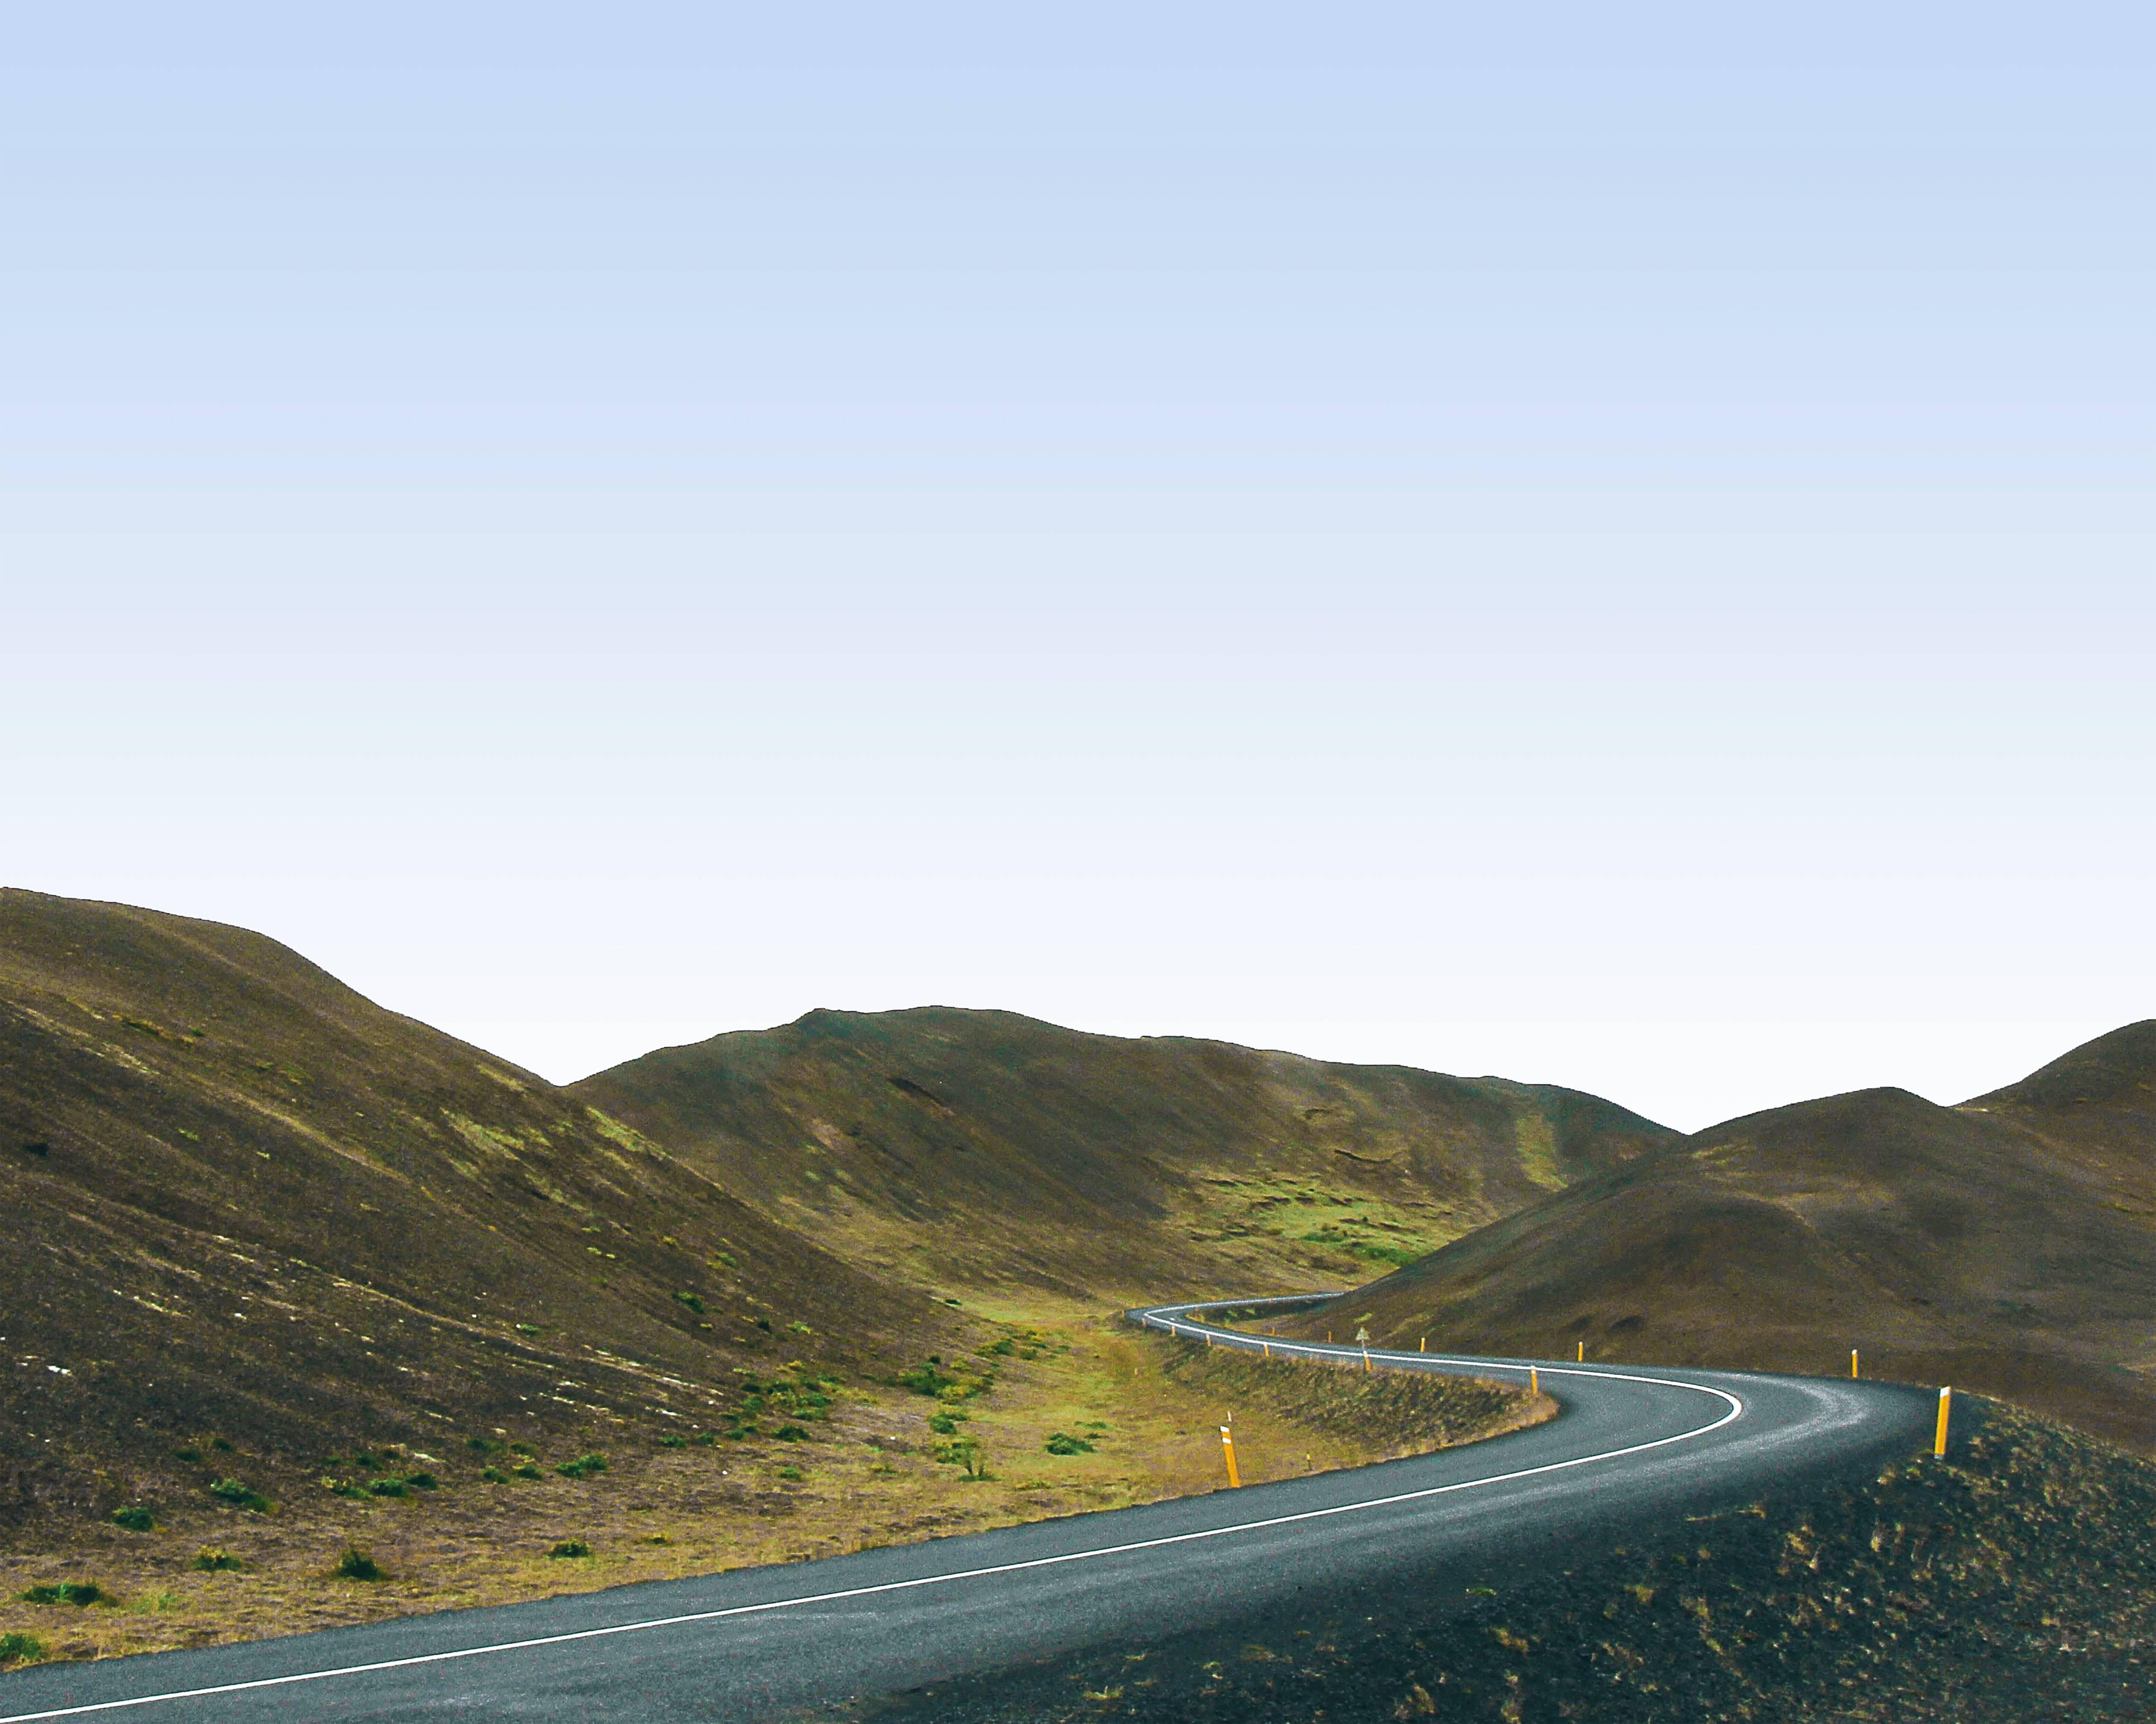 Icelandic-road-zig-zag-between-three-hills-in-summer-with-green-around